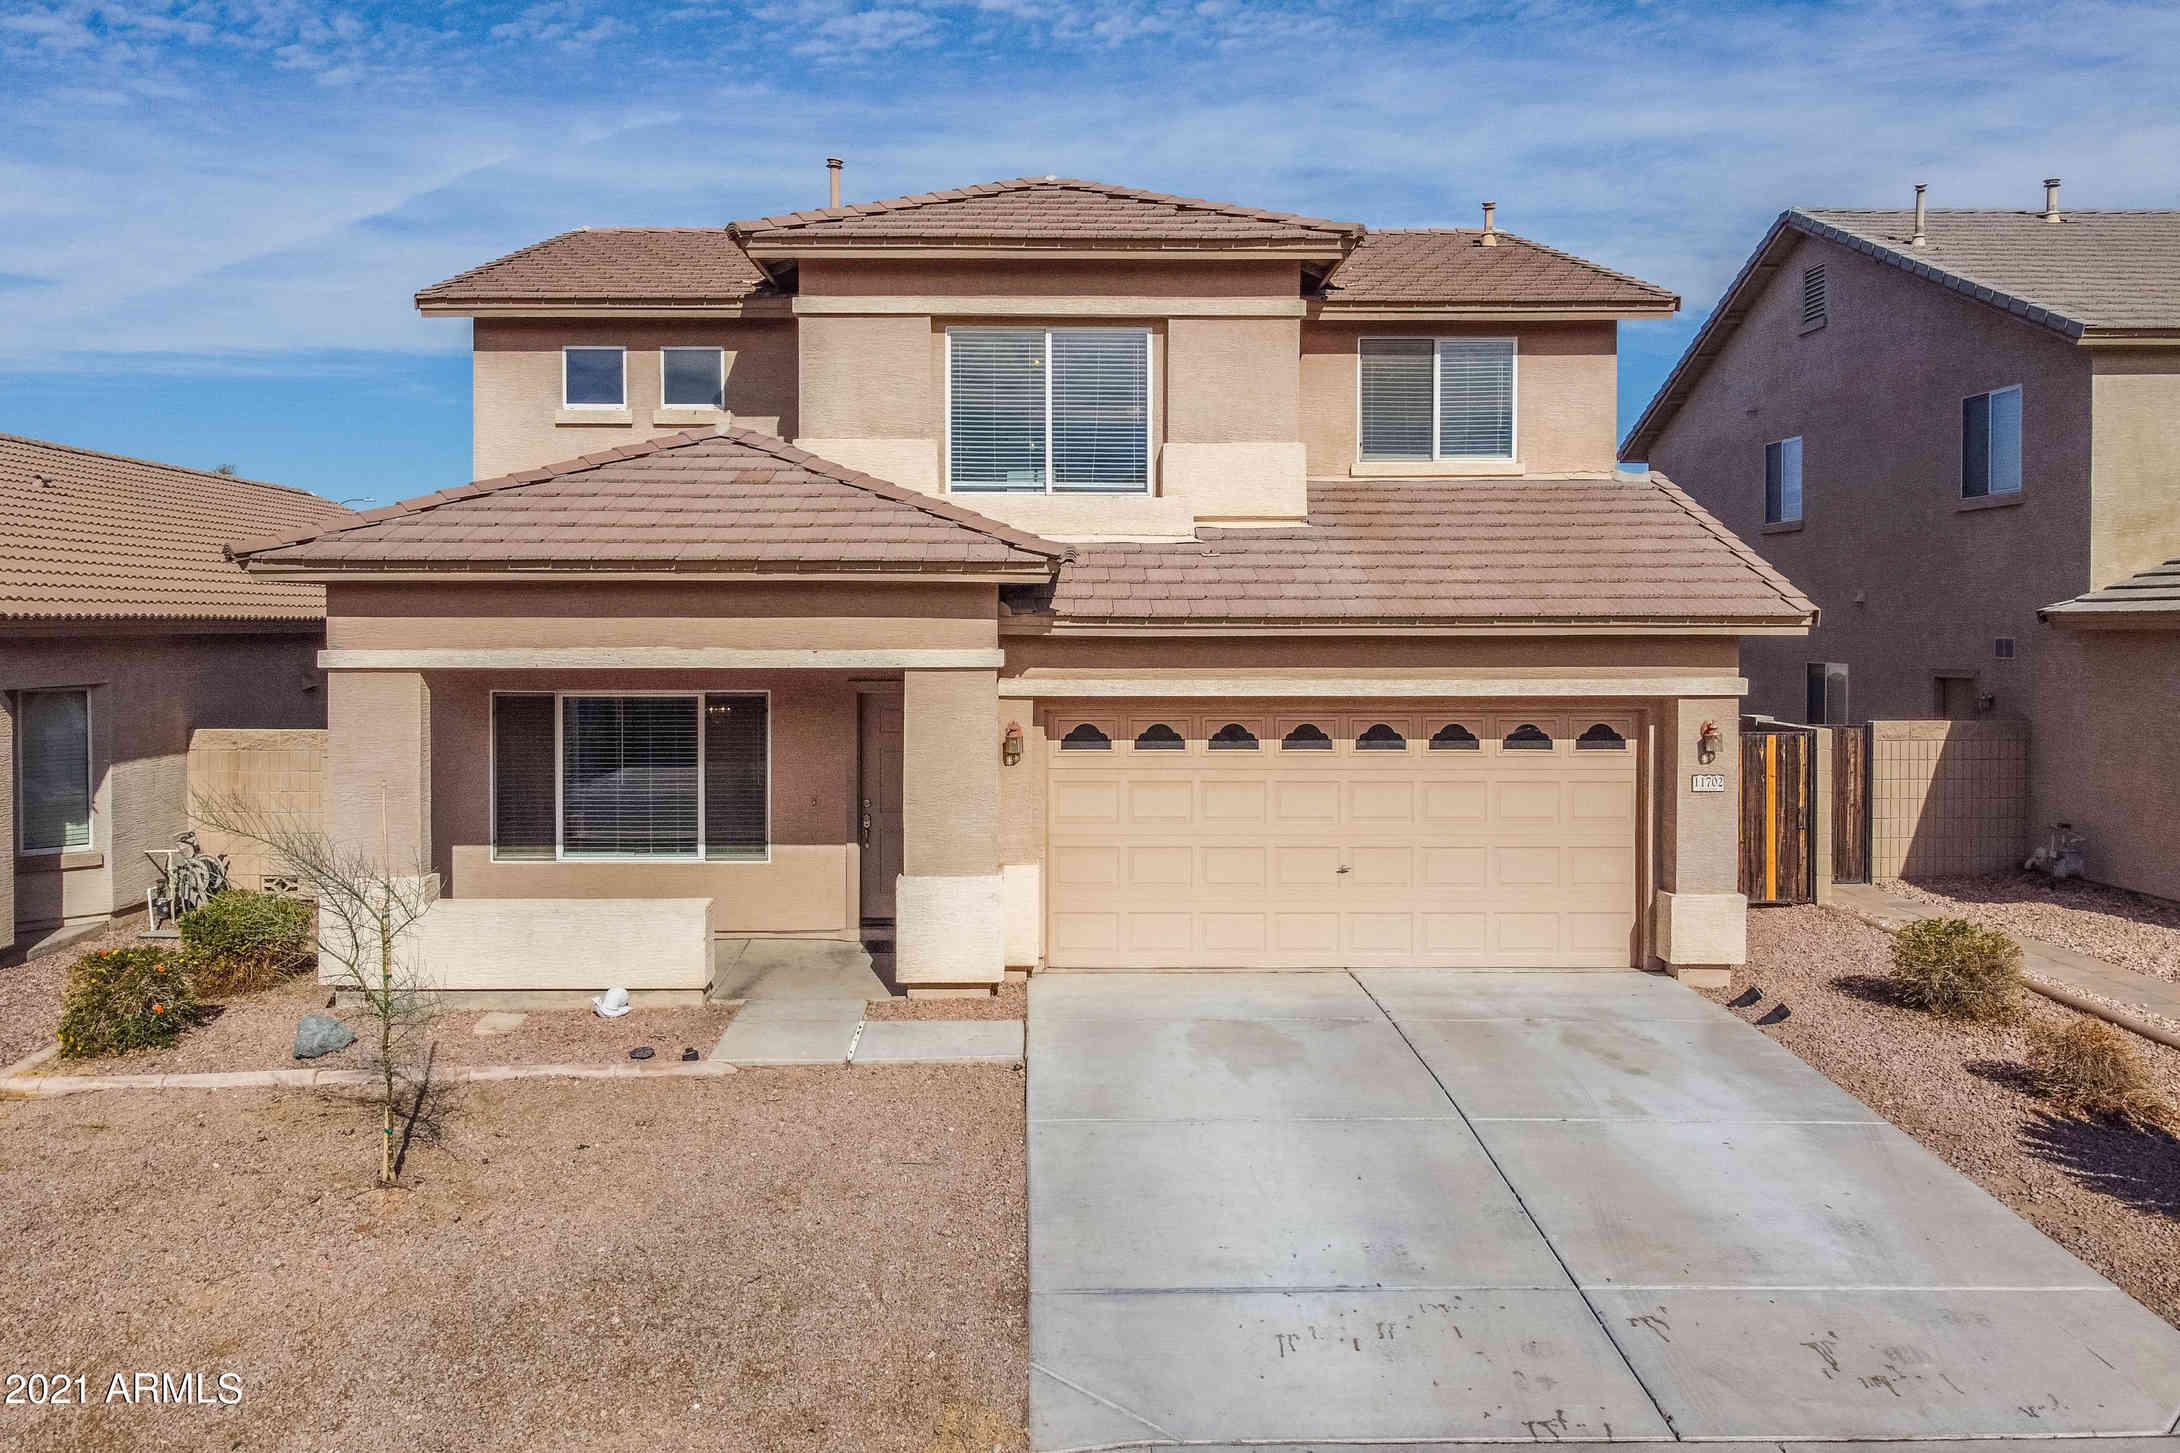 11702 W JEFFERSON Street, Avondale, AZ, 85323,